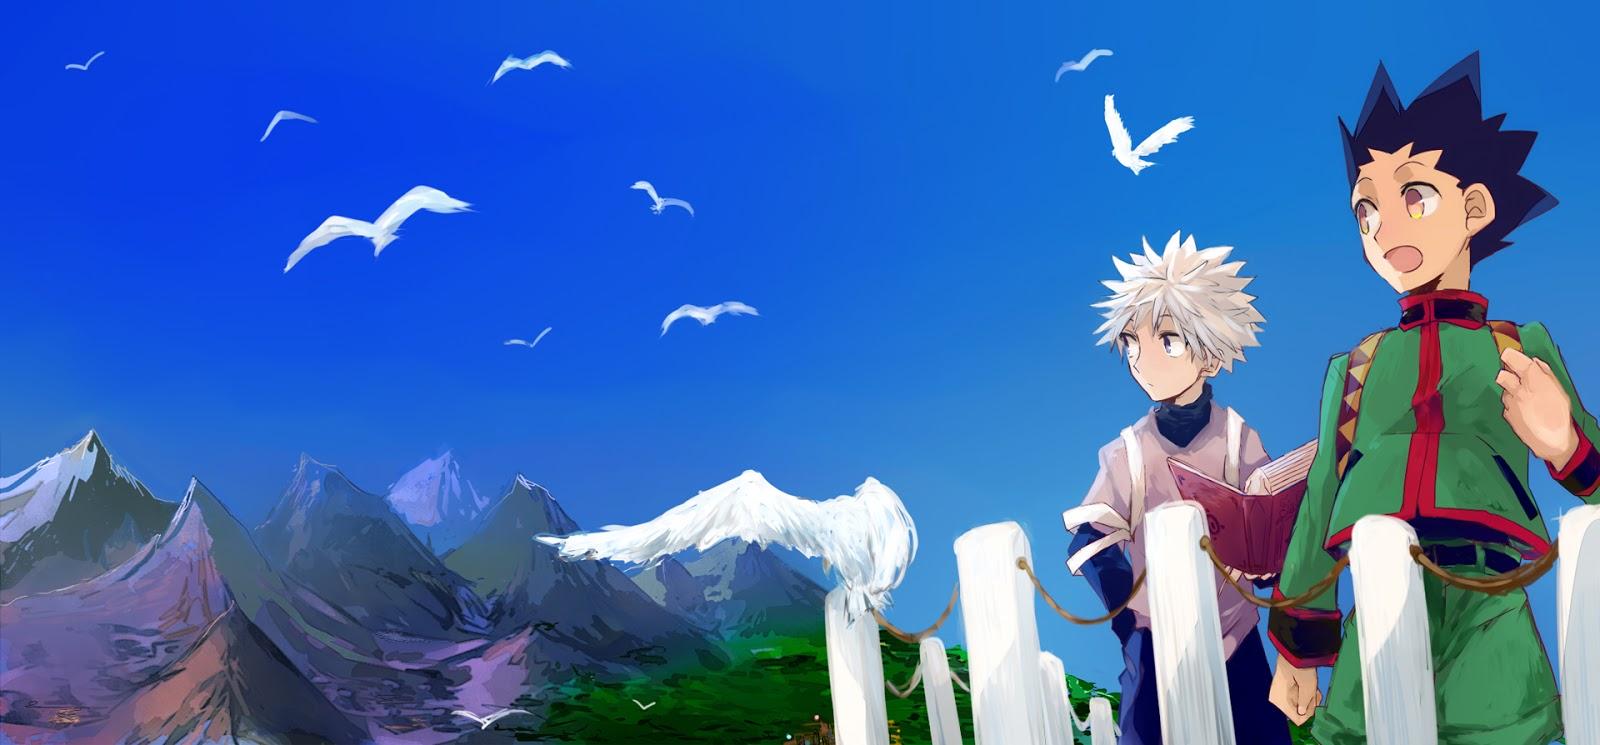 Gon Killua Greed Island Hunter X Hunter 2011 Anime HD Wallpaper 1600x745